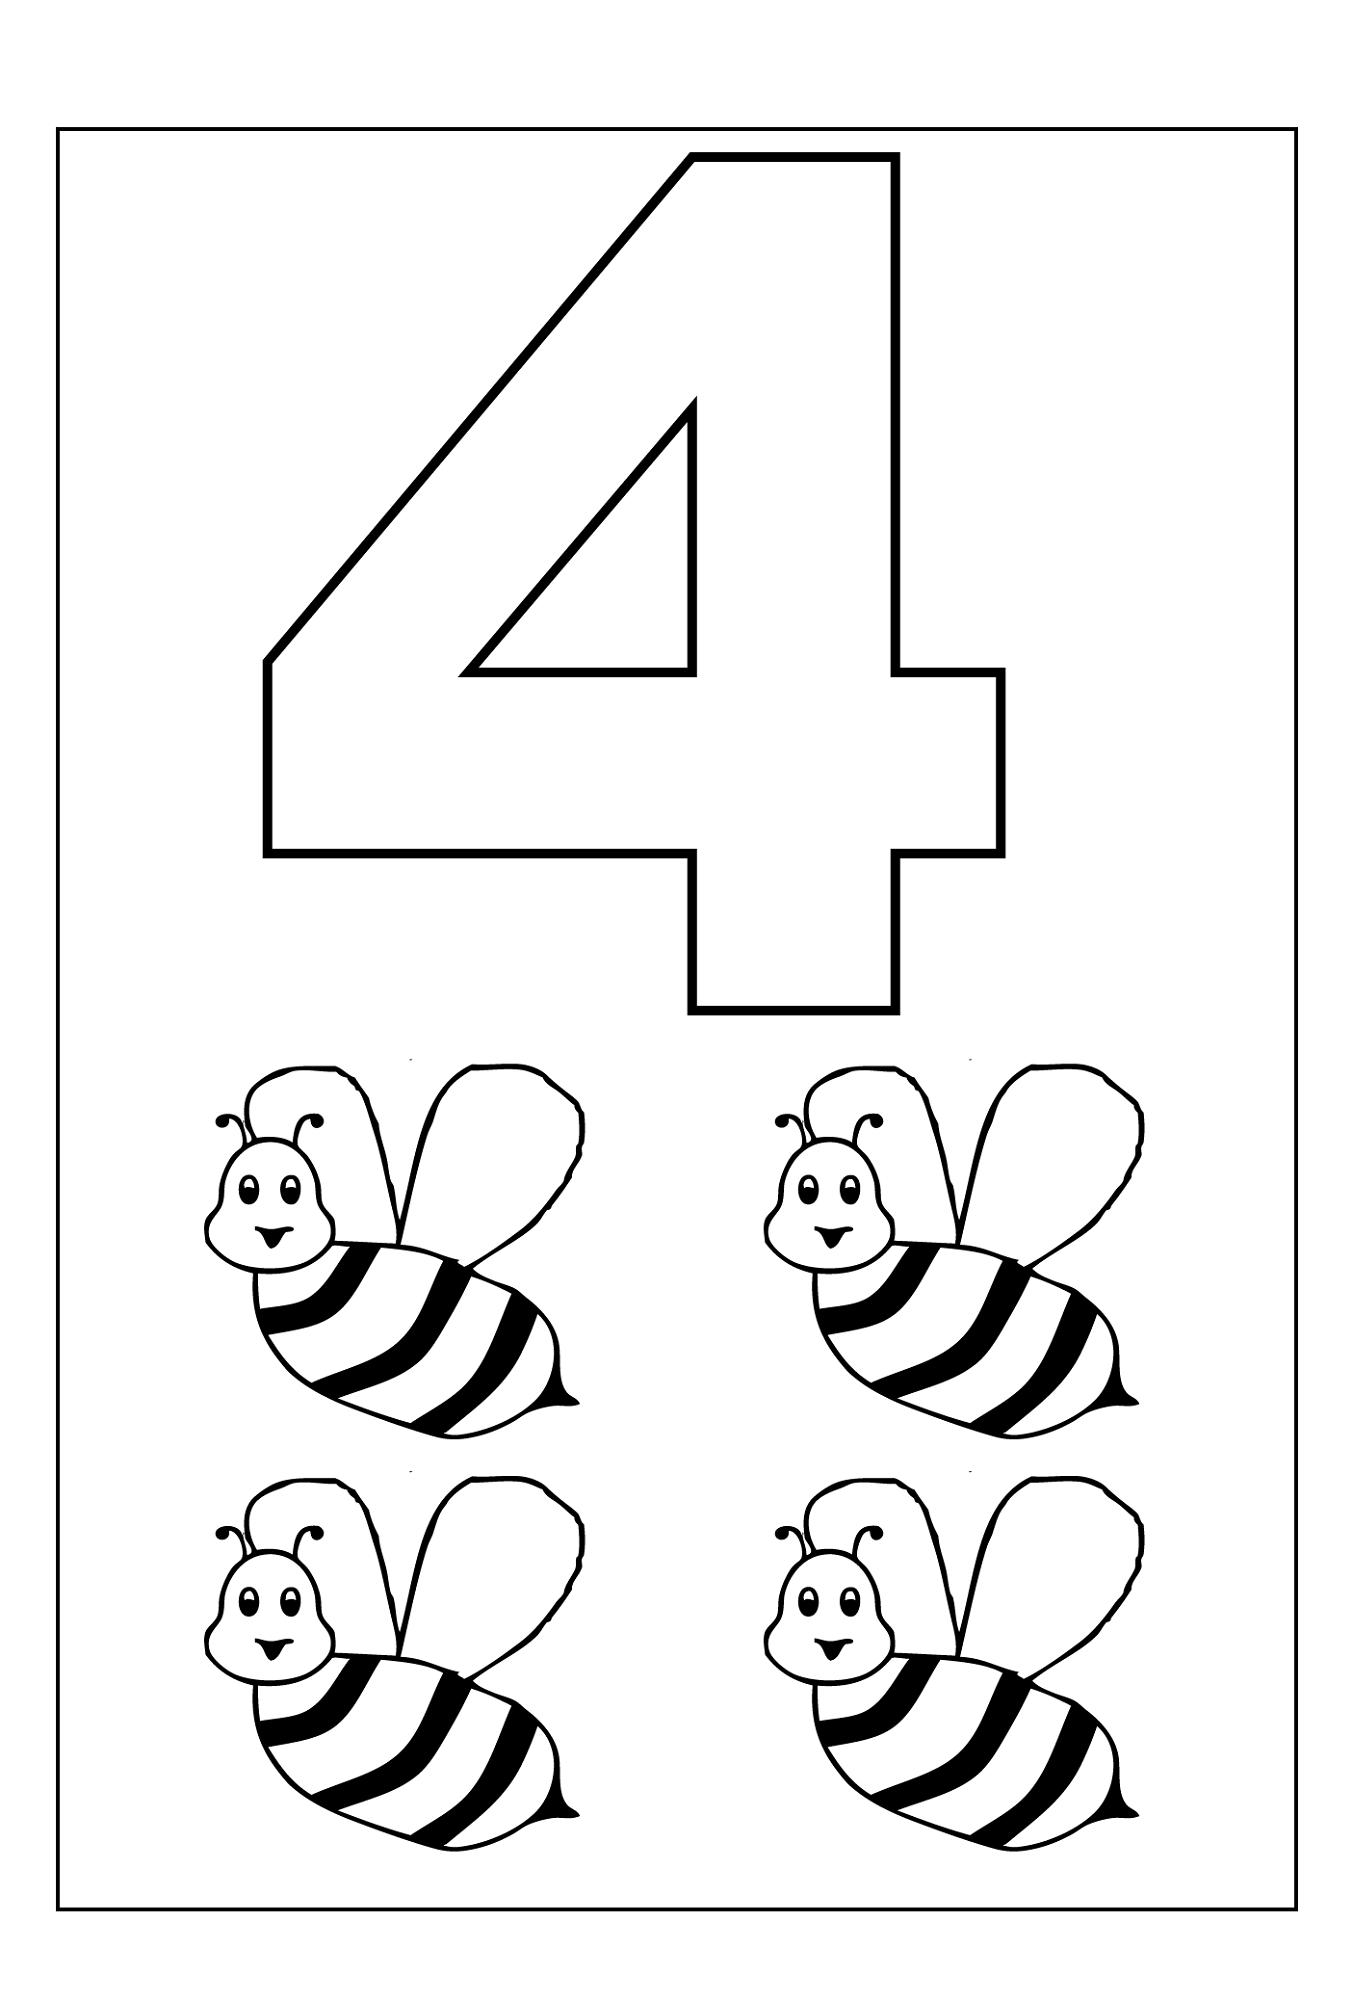 number 4 worksheet for beginners